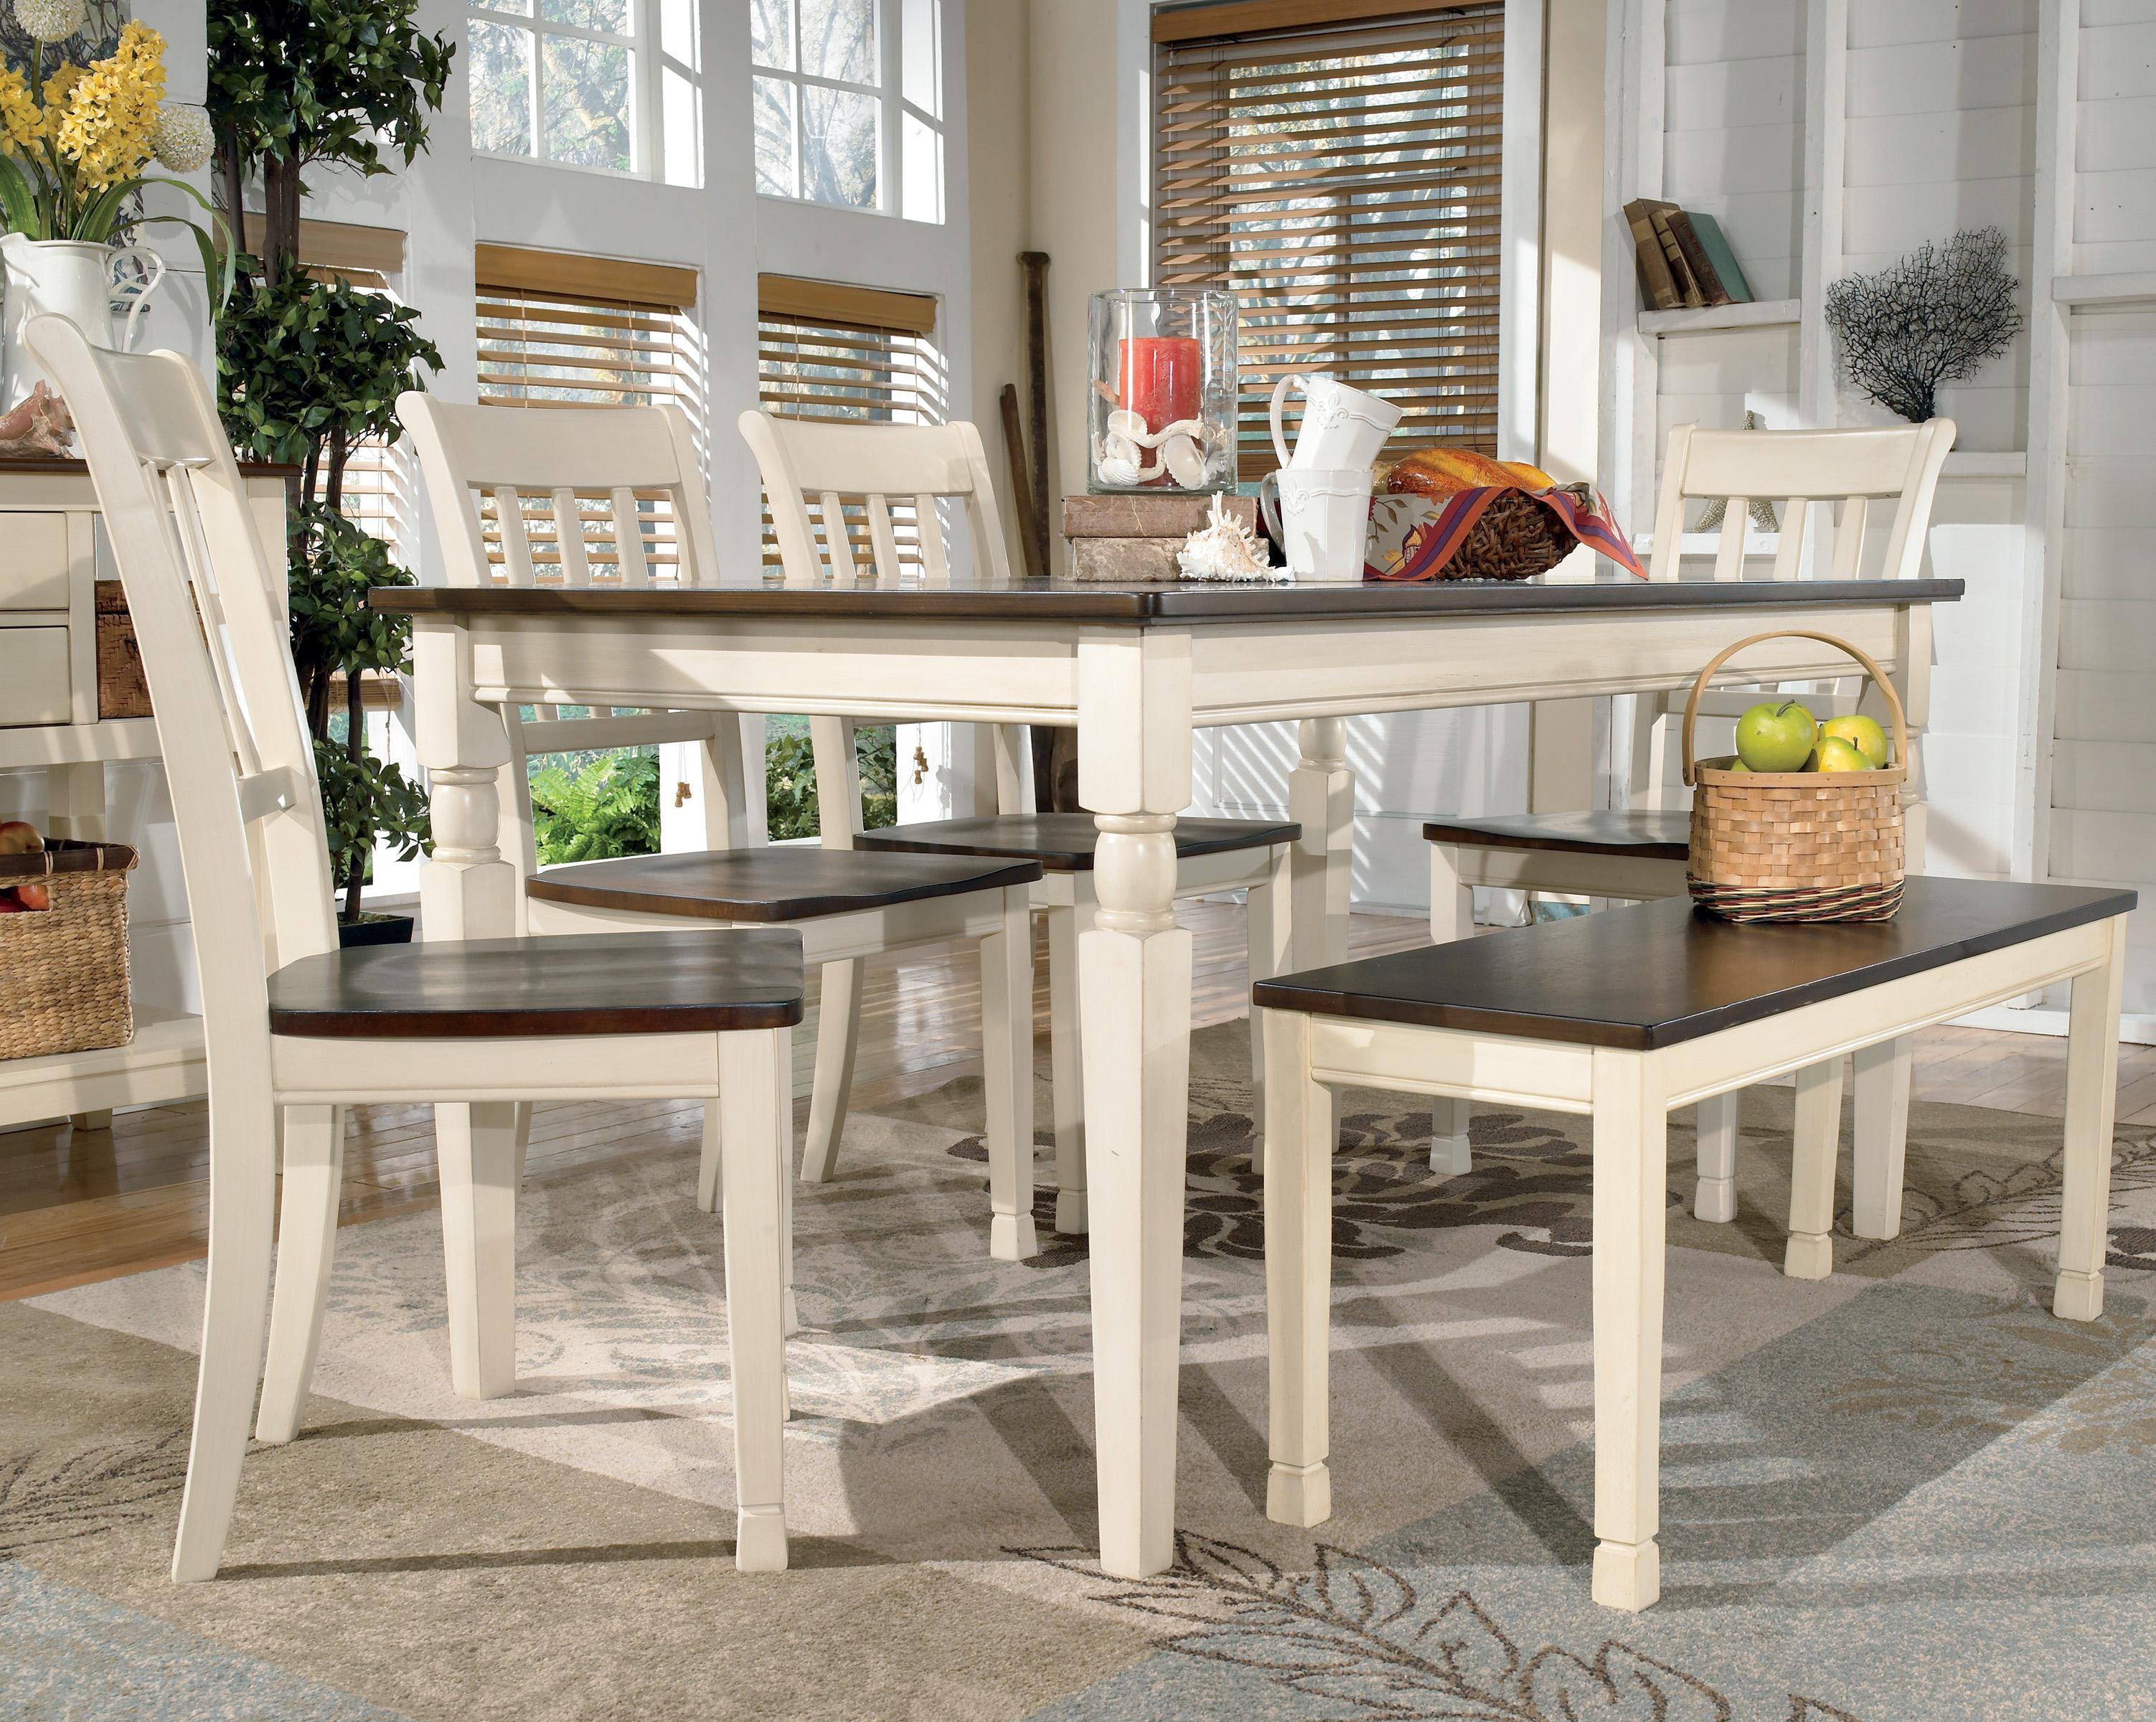 Ashley S Nest Decorating A Dining Room: Signature Design By Ashley Whitesburg Rectangular Dining